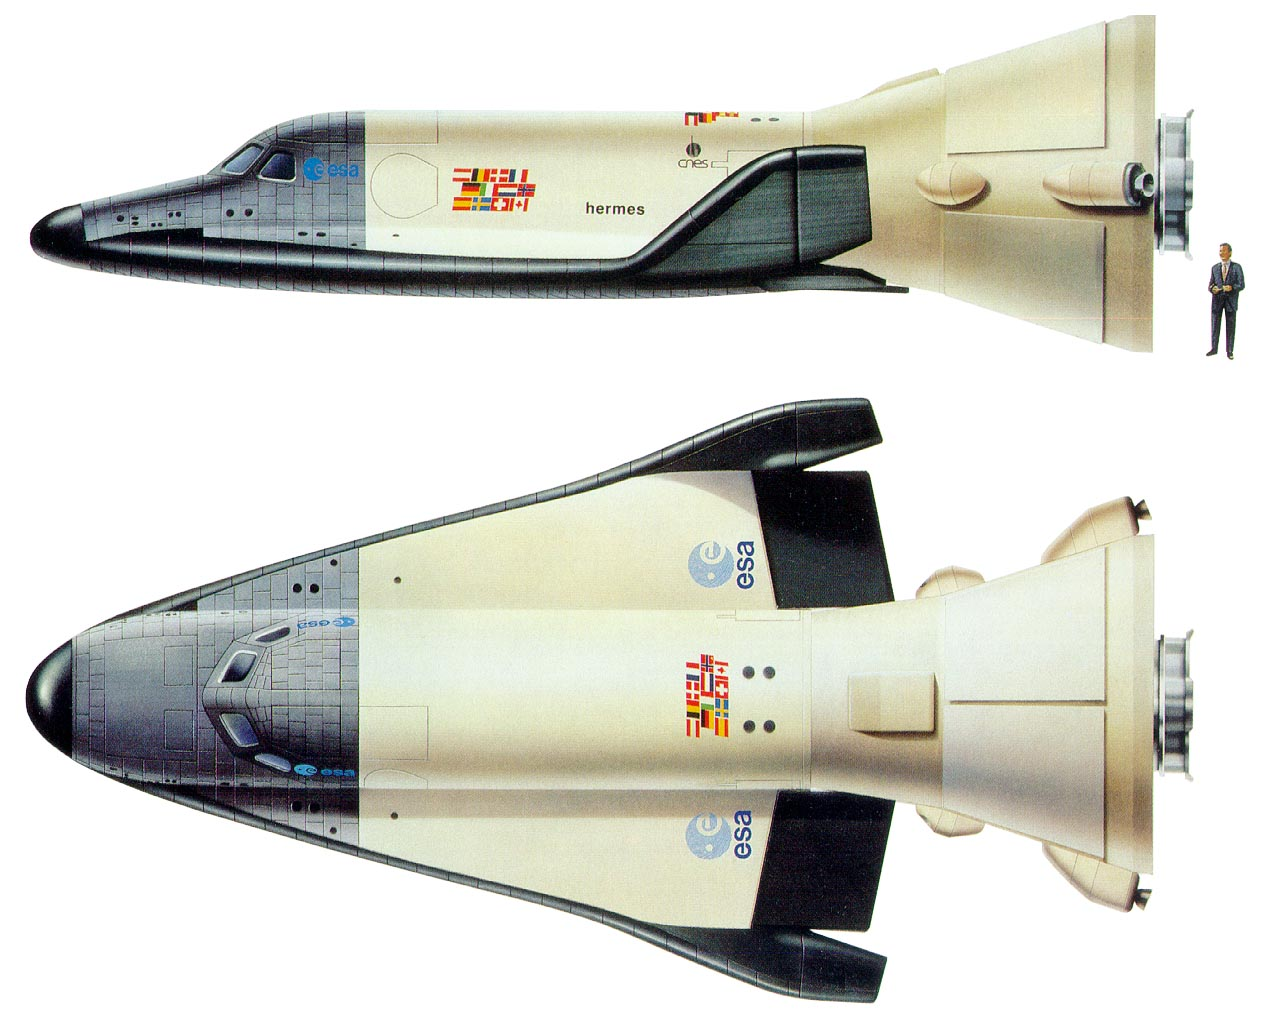 hermes space shuttle - photo #24